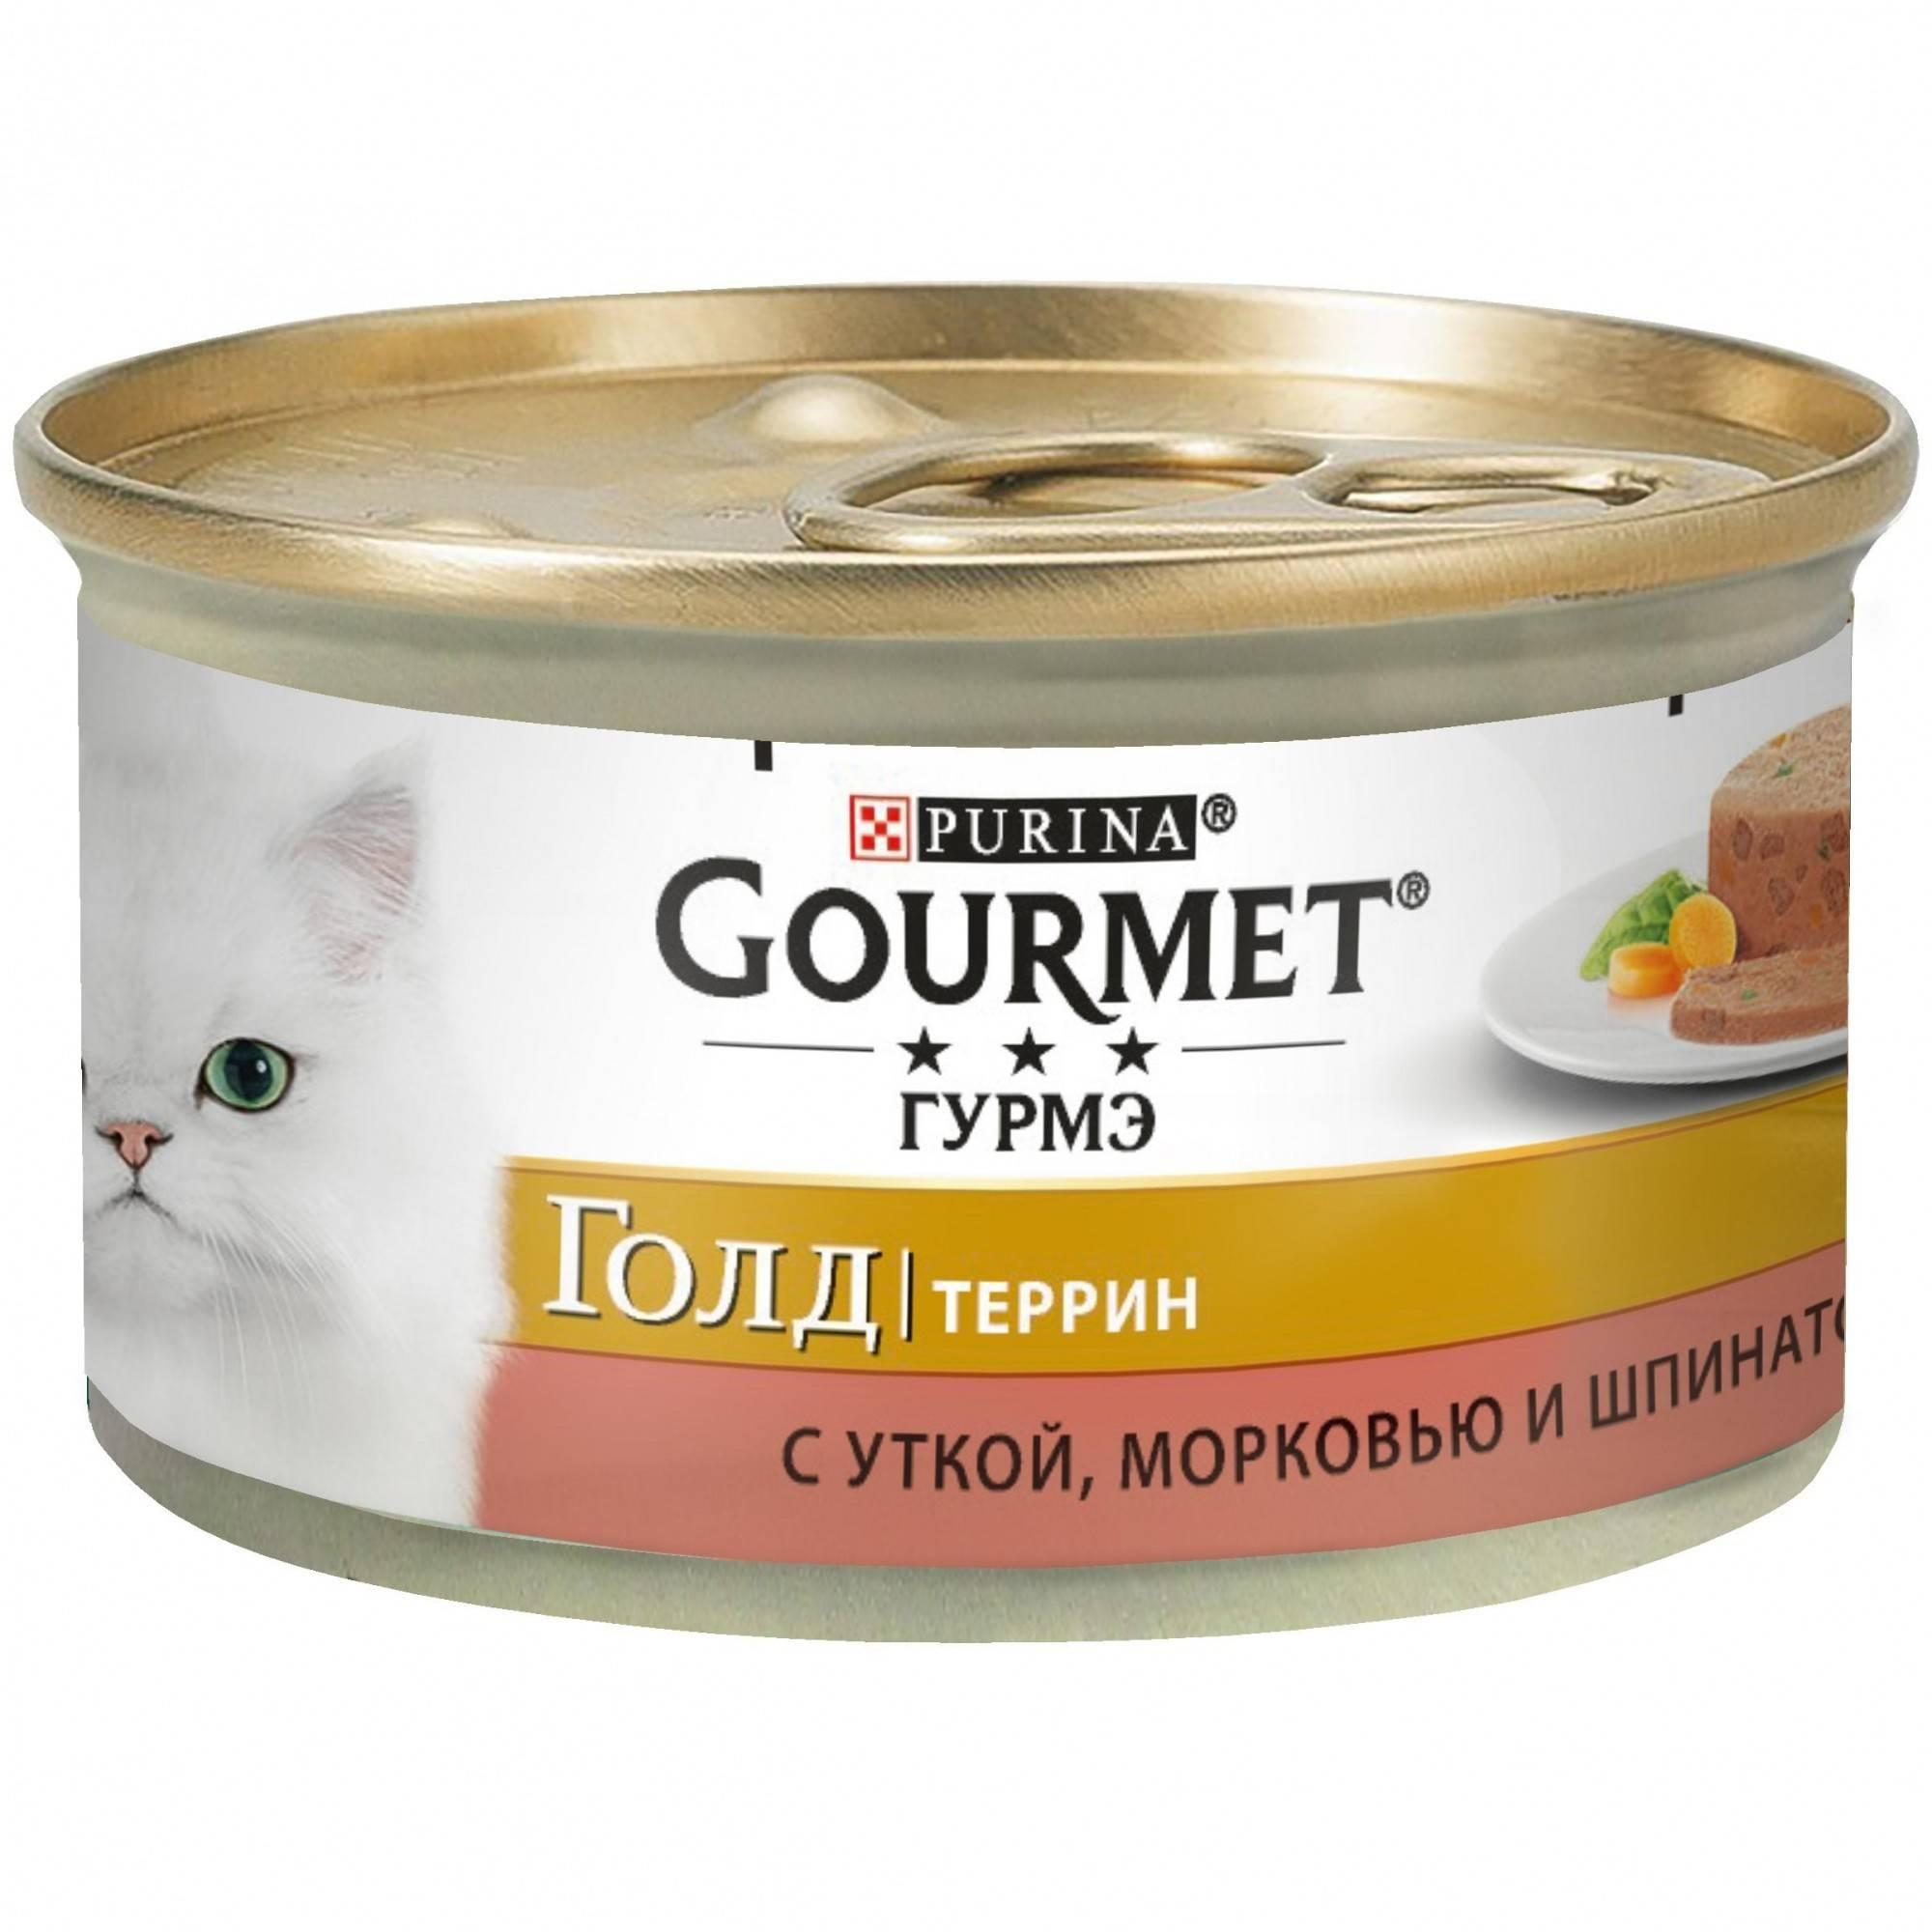 GOURMET Gold Terrine Duck & Carrot & Spinach – консерва з качкою, морквою та шпинатом для дорослих котів